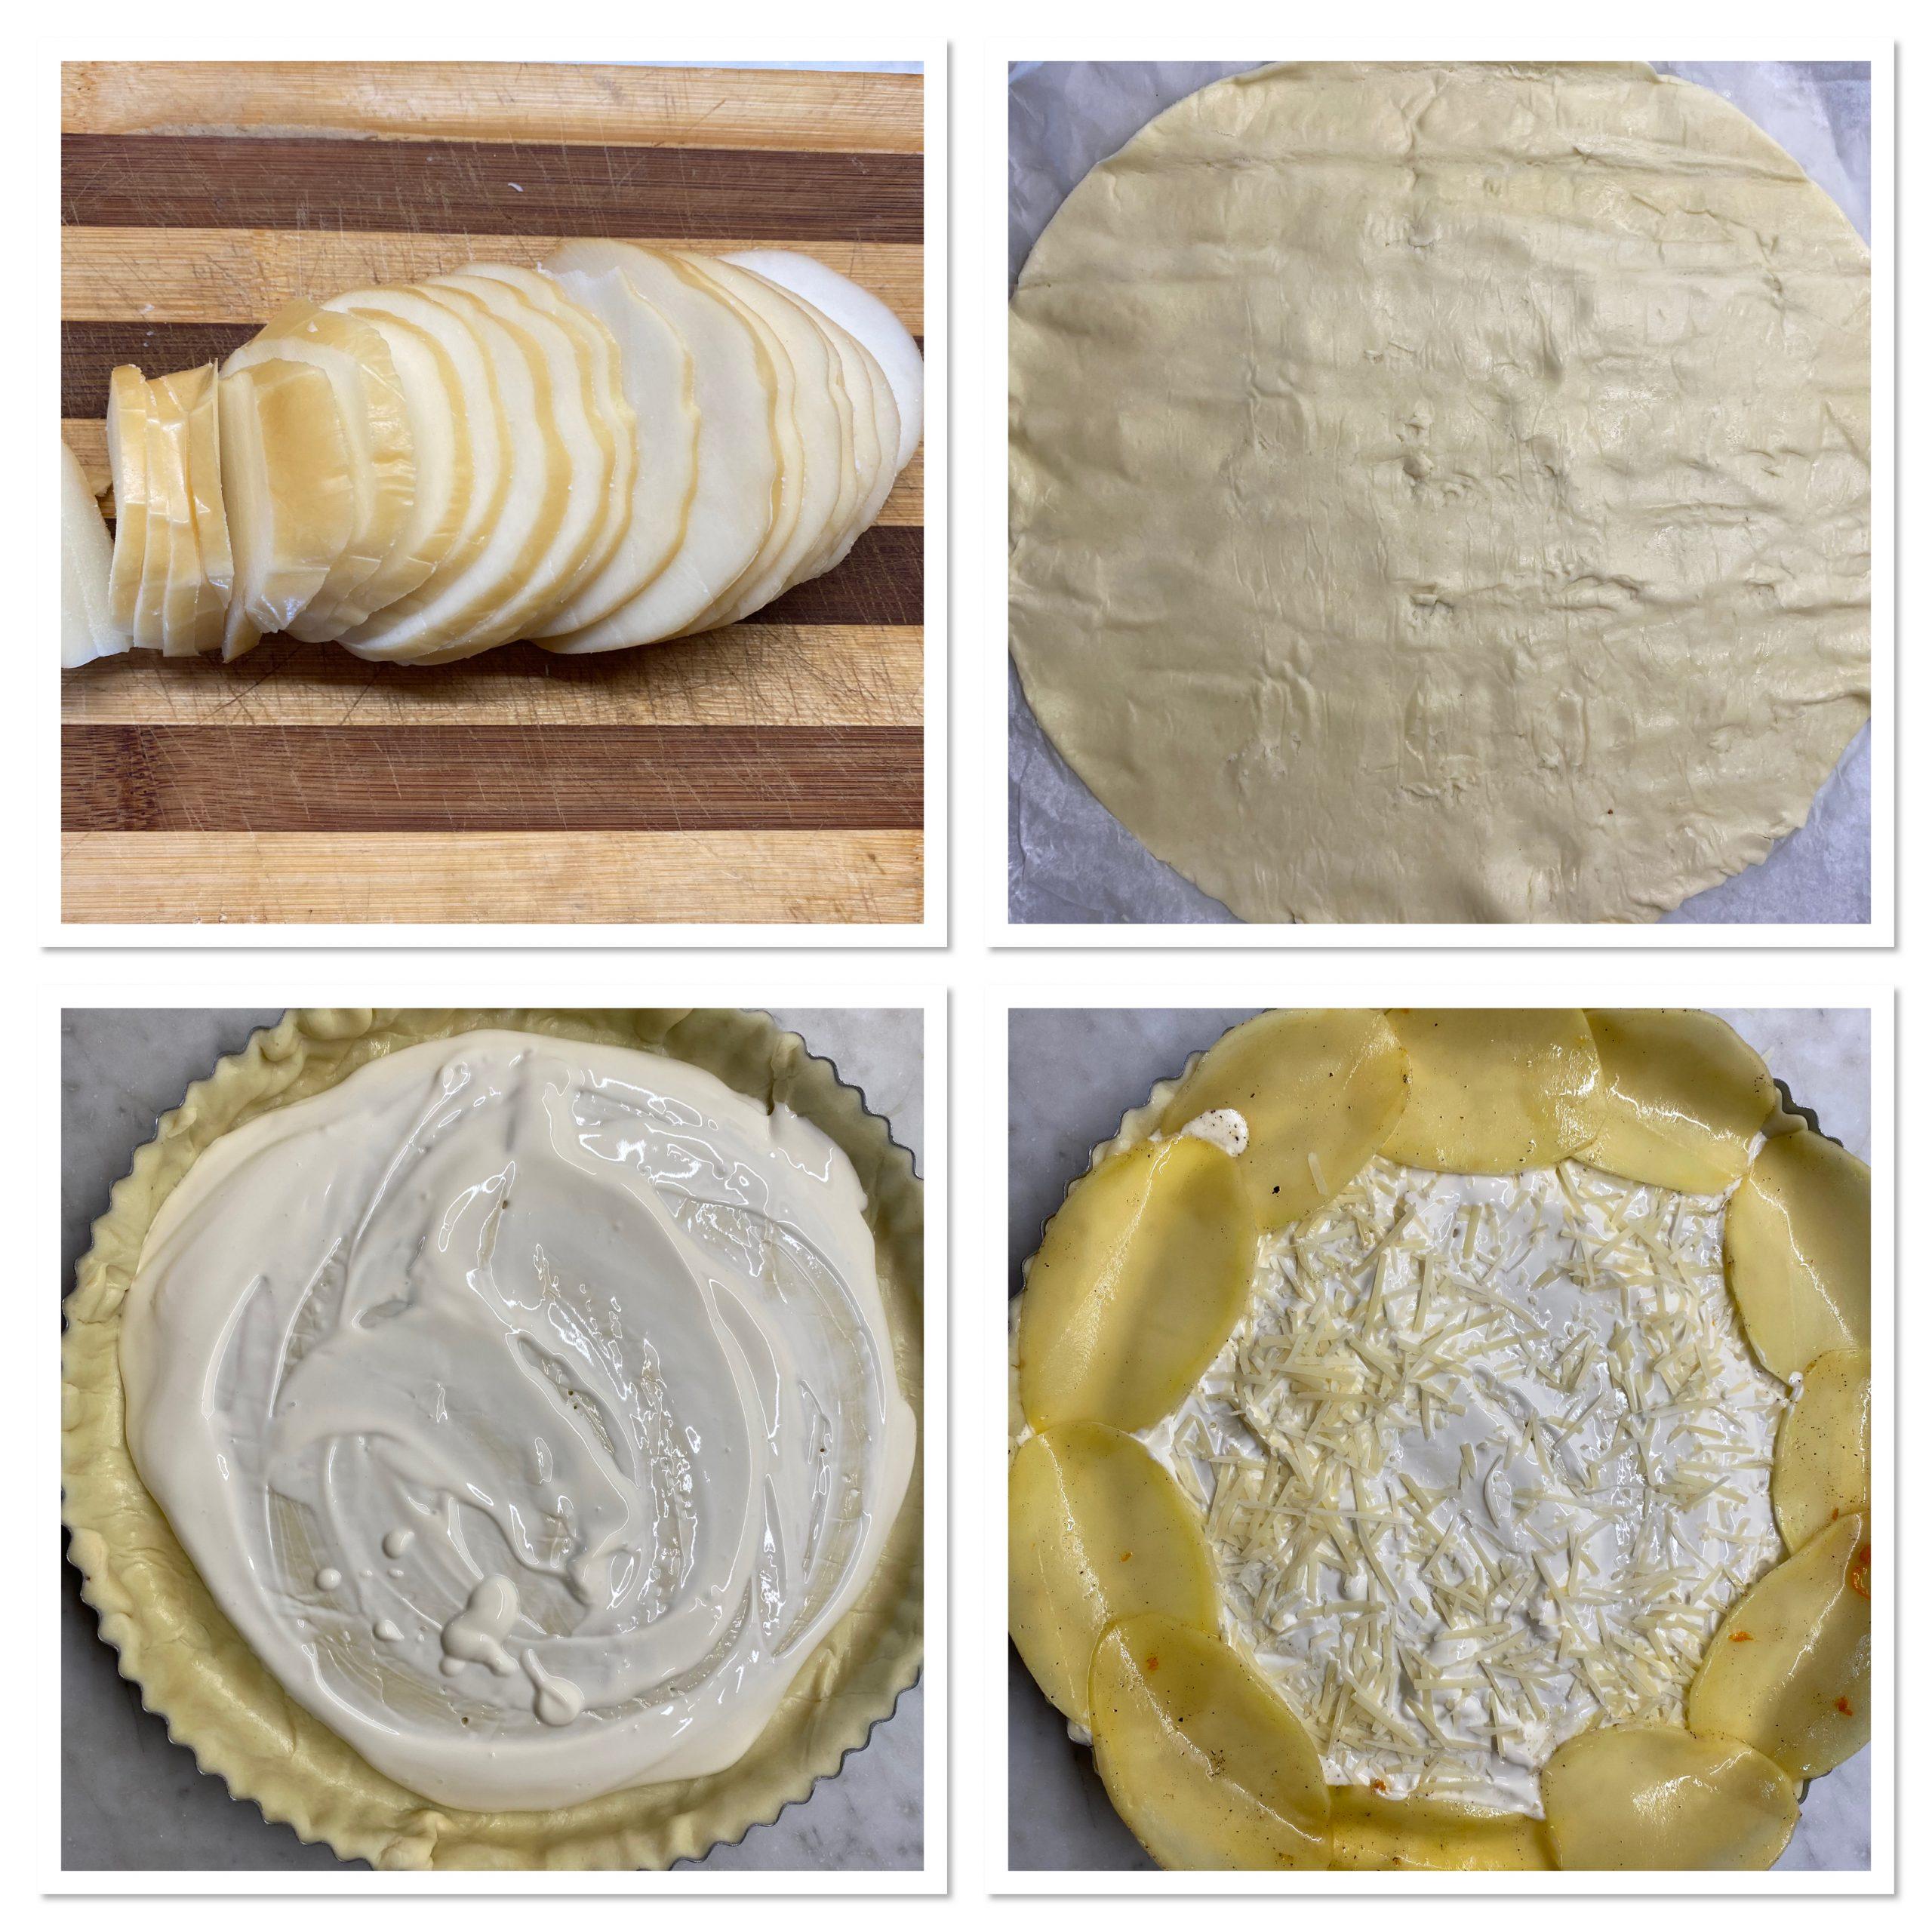 Torta salata con zucca patate e provola affumicata